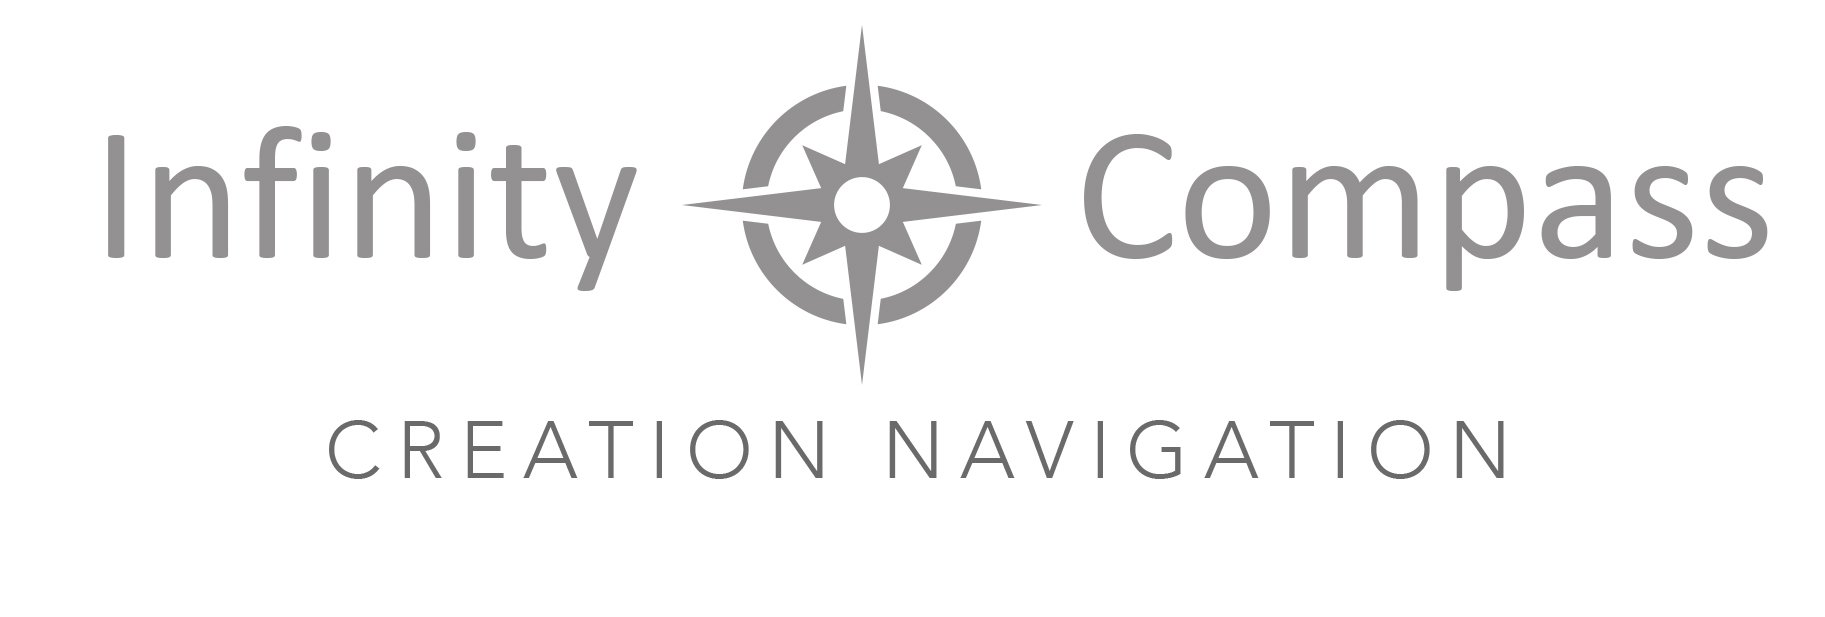 Infinity Compass